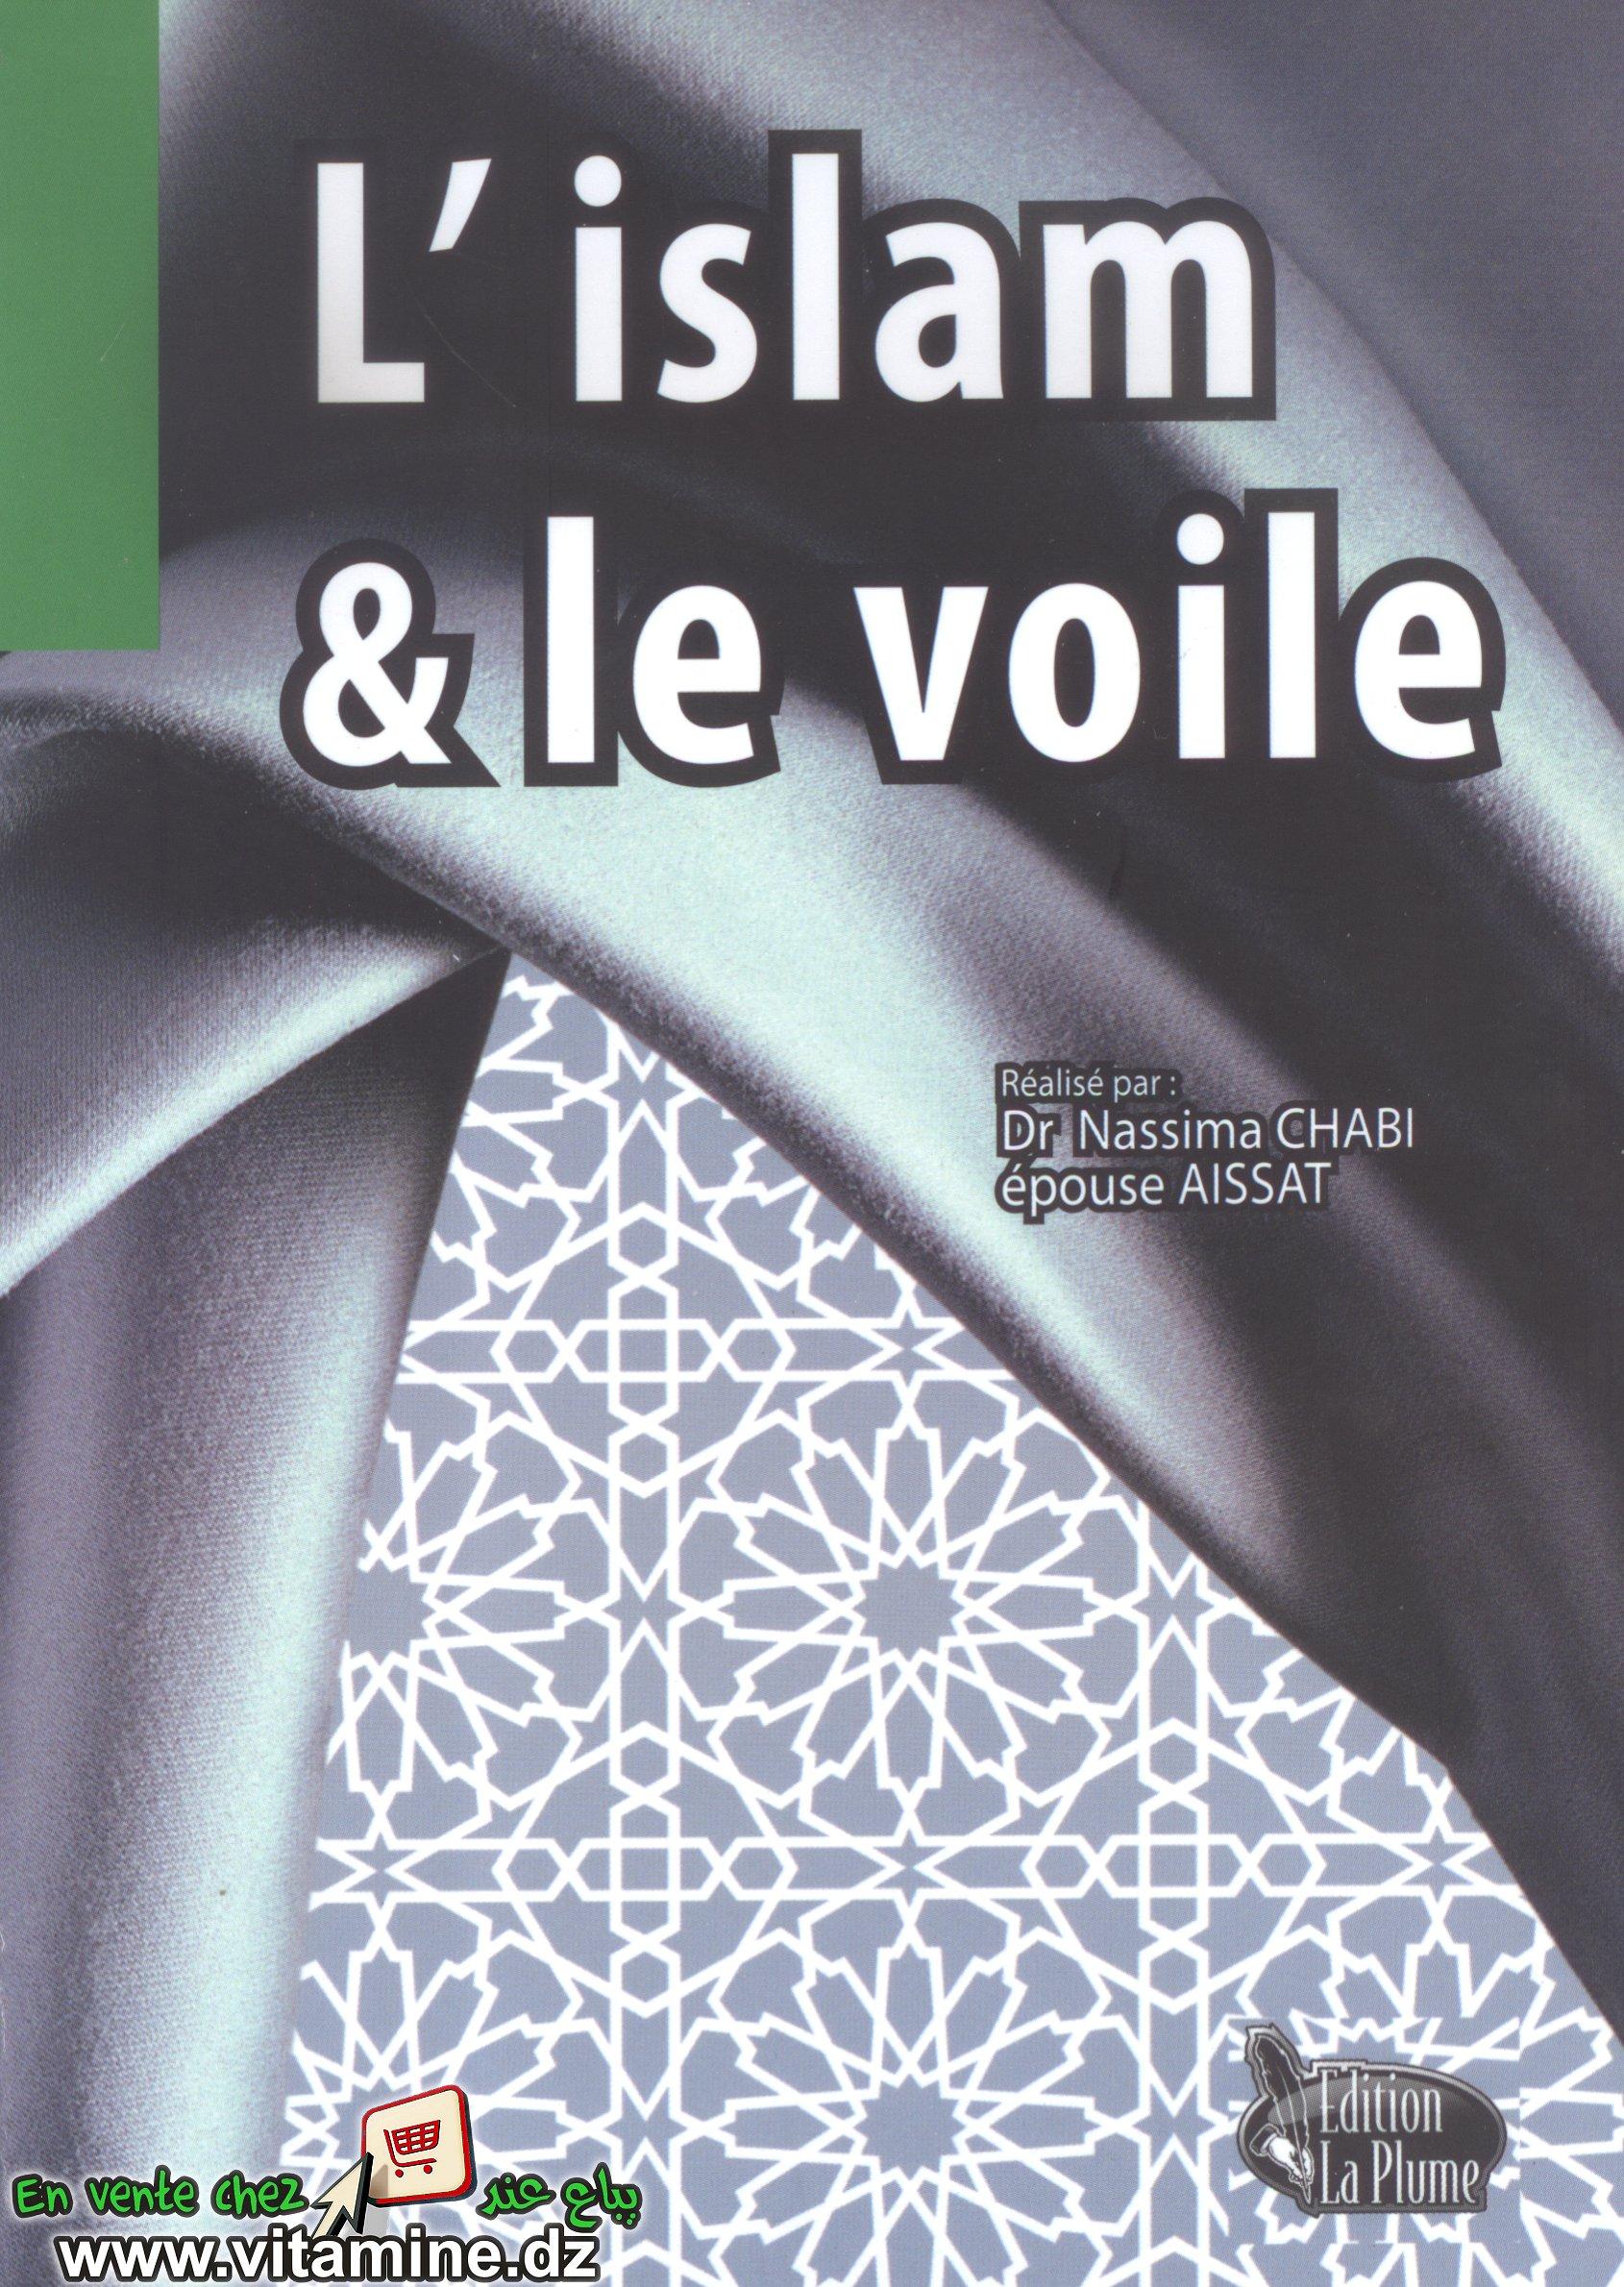 Nassima Chabi - L'Islam et le voile